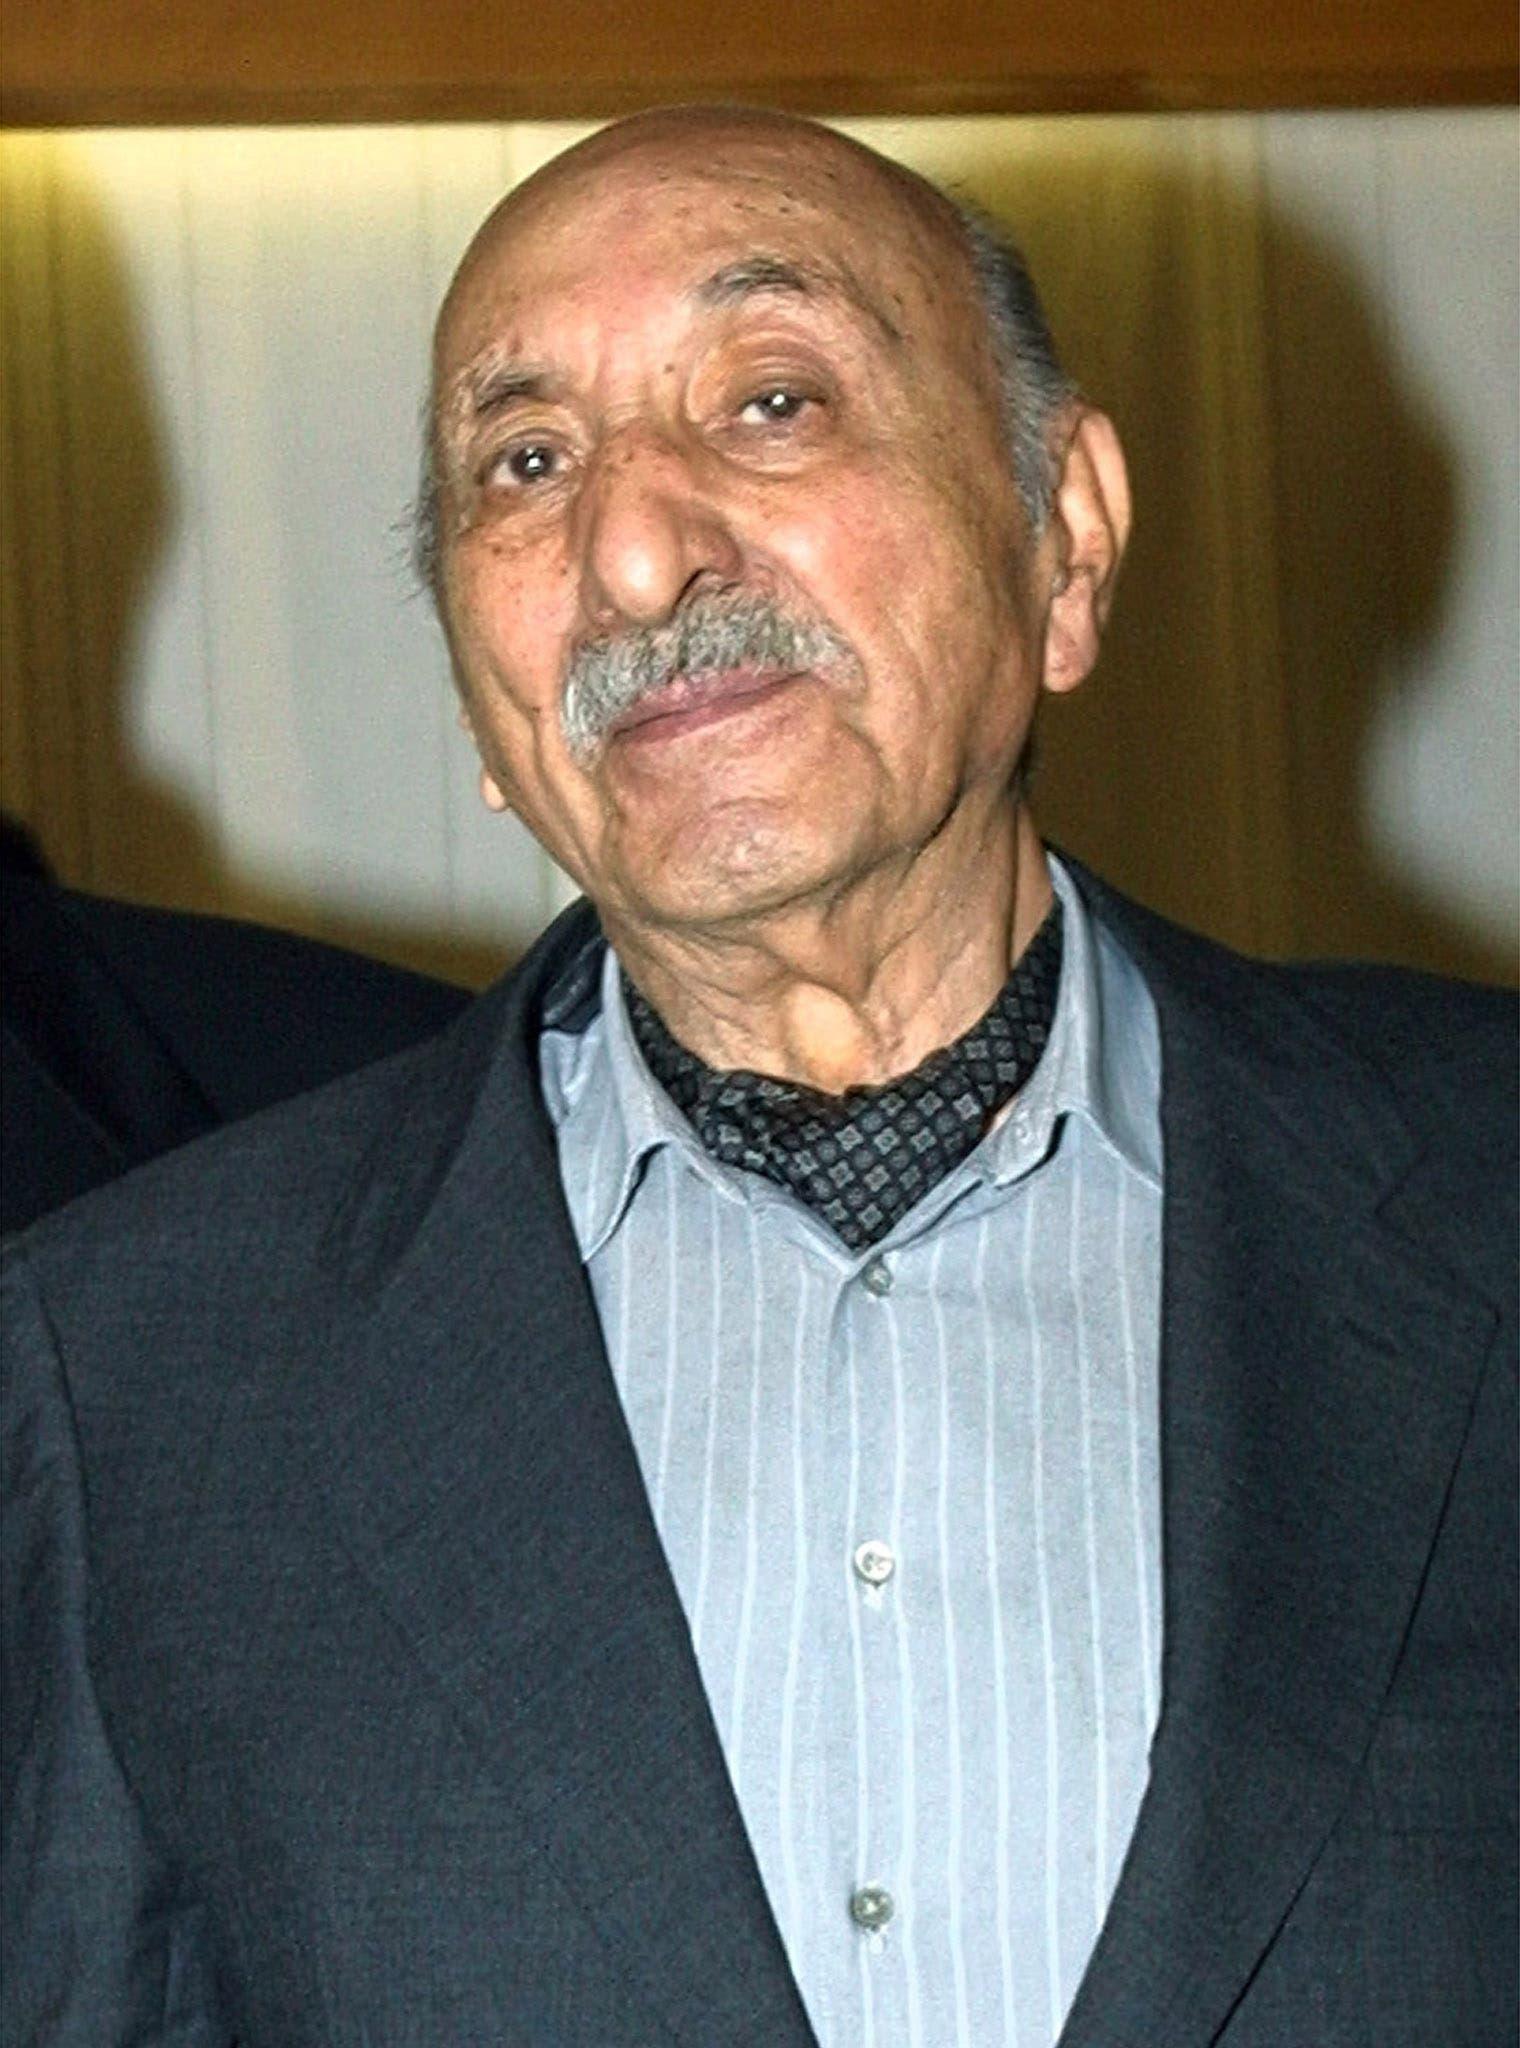 ملك أفغانستان السابق  محمد ظاهر شاه